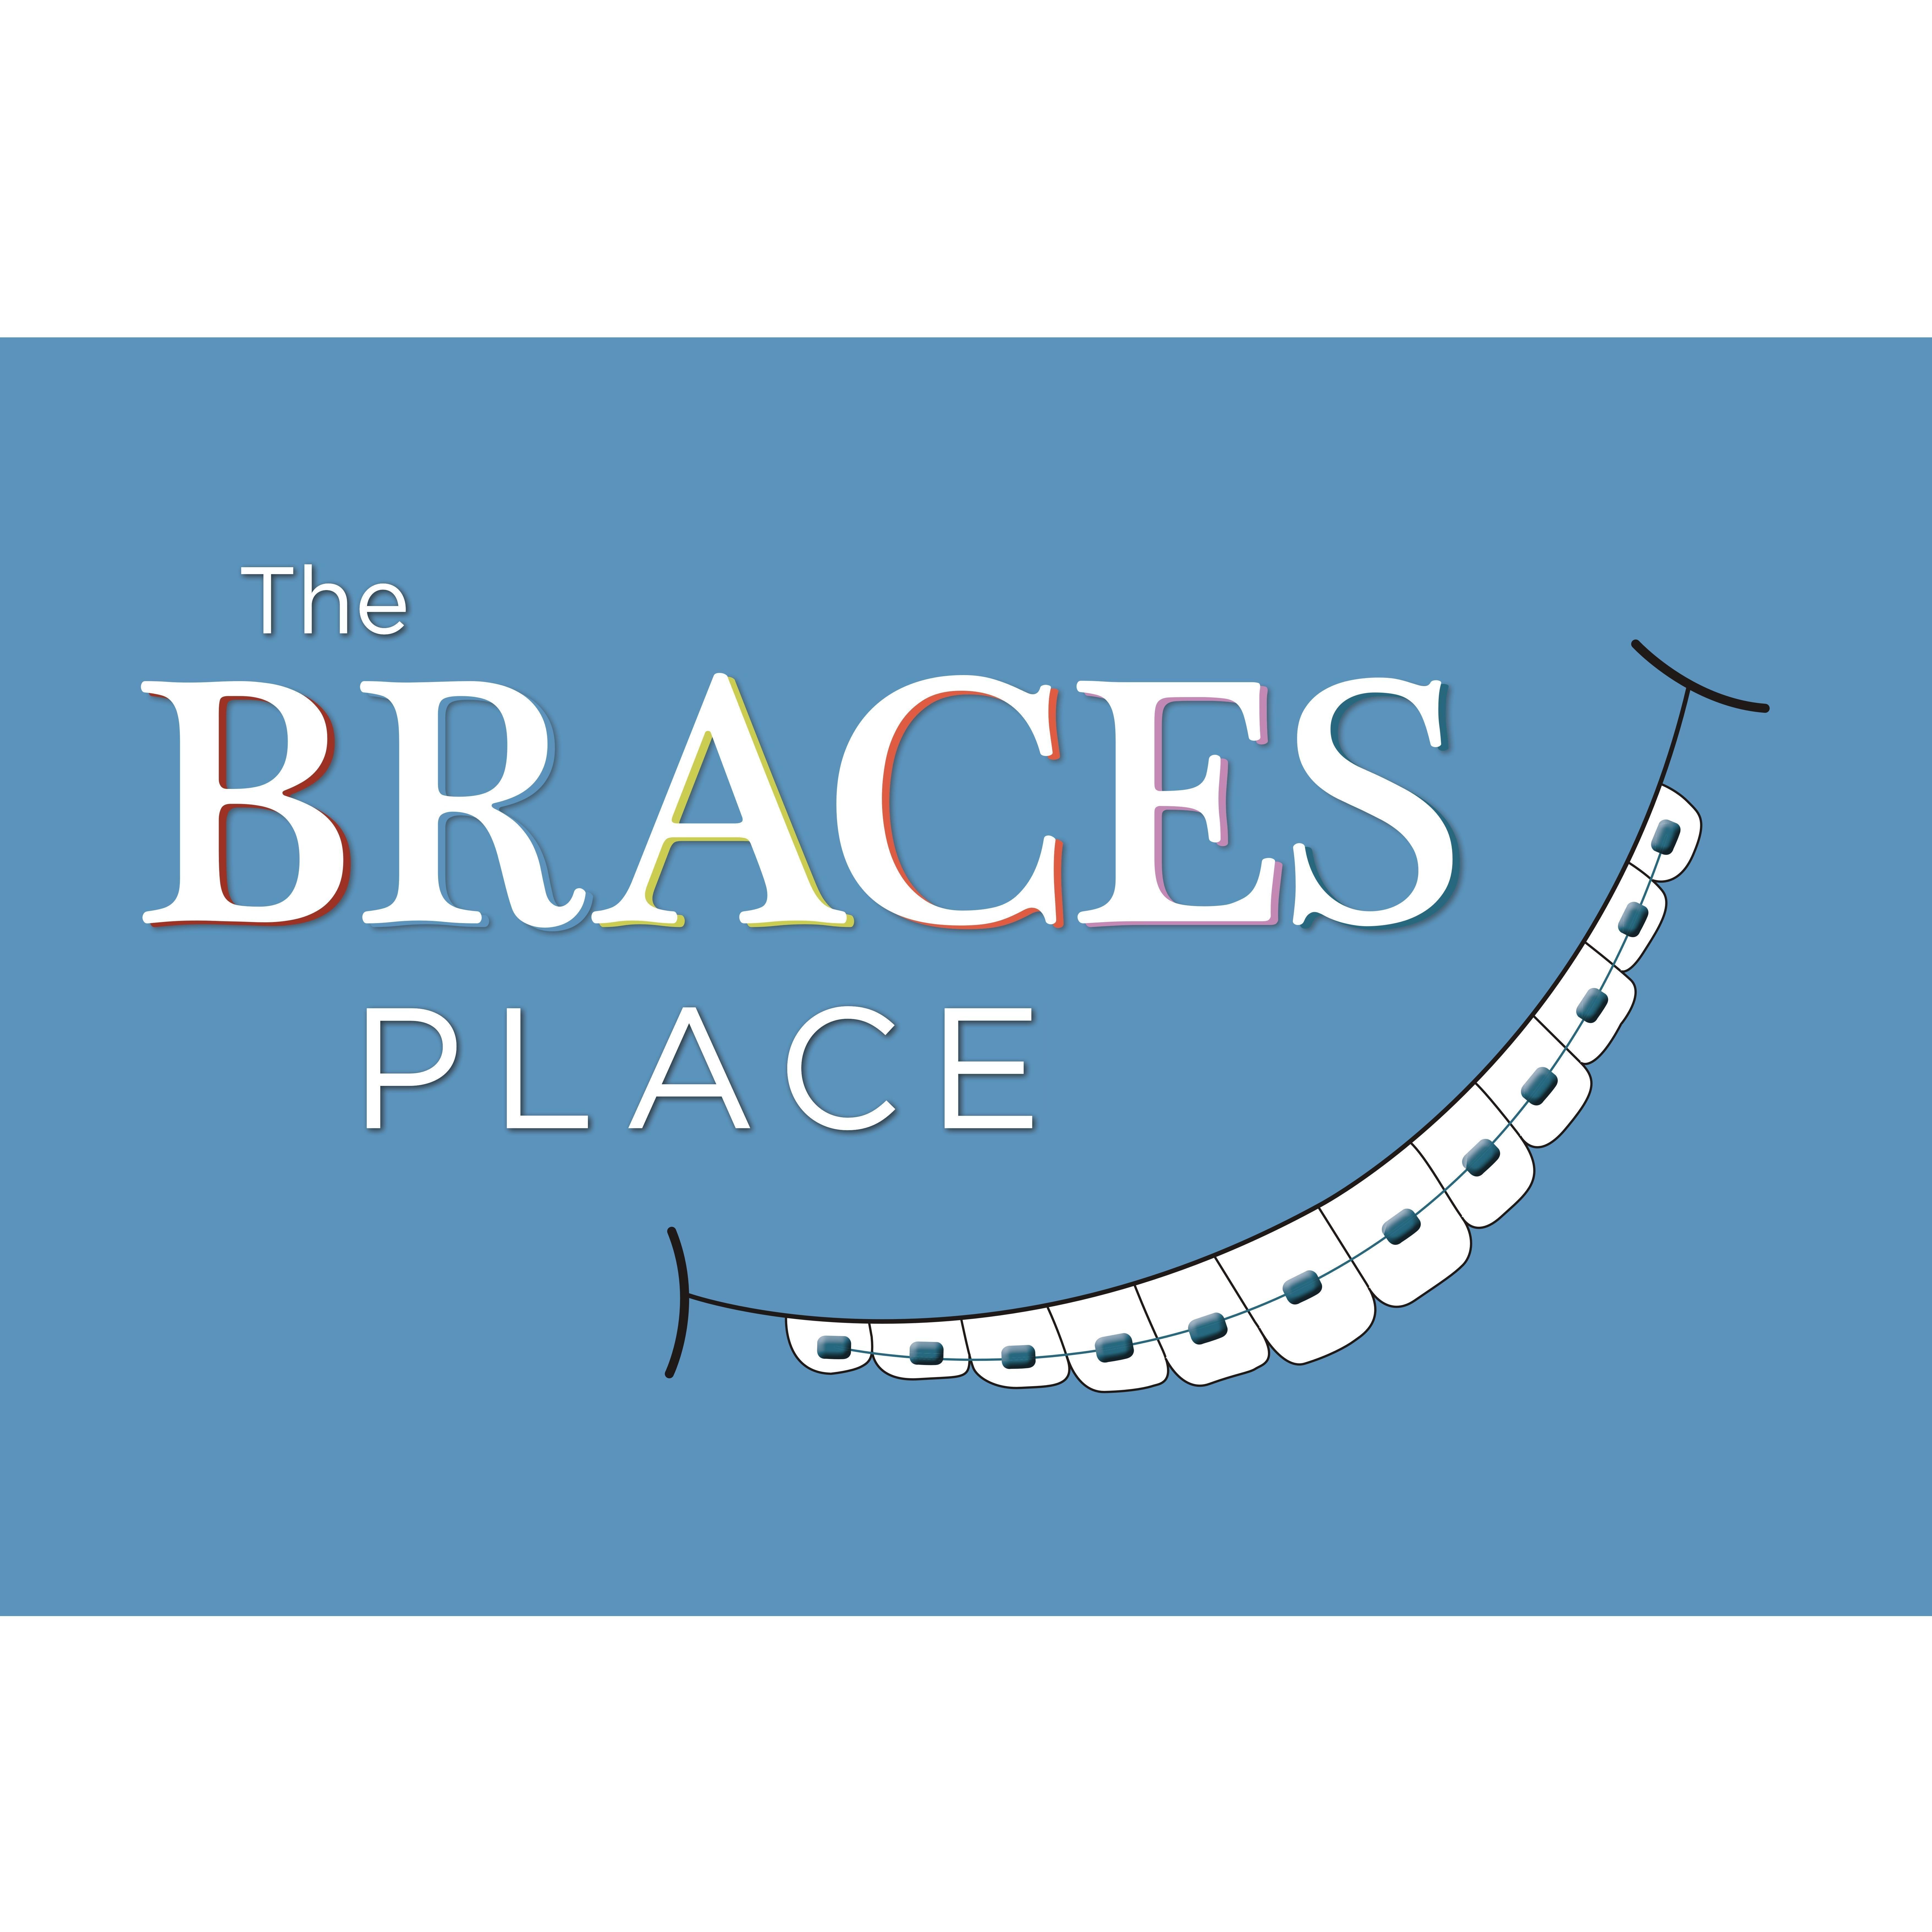 The Braces Place at Davis Square image 1